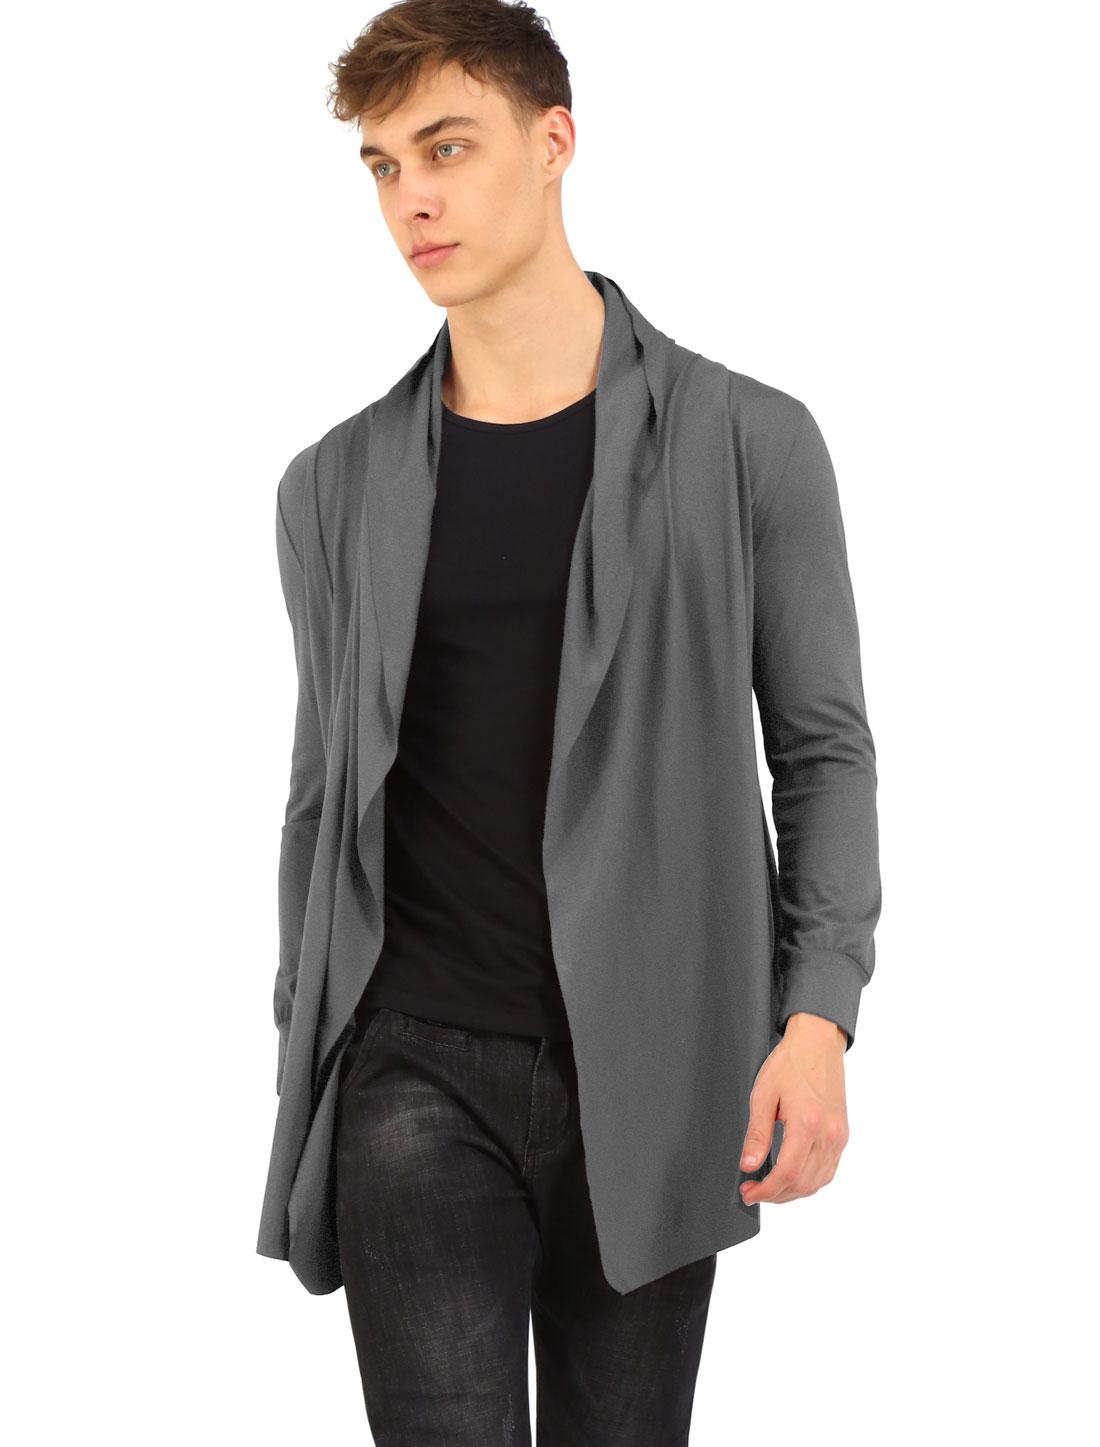 Men Shawl Collar Open Front Pockets High-Low Hem Casual Long Cardigan Gray S